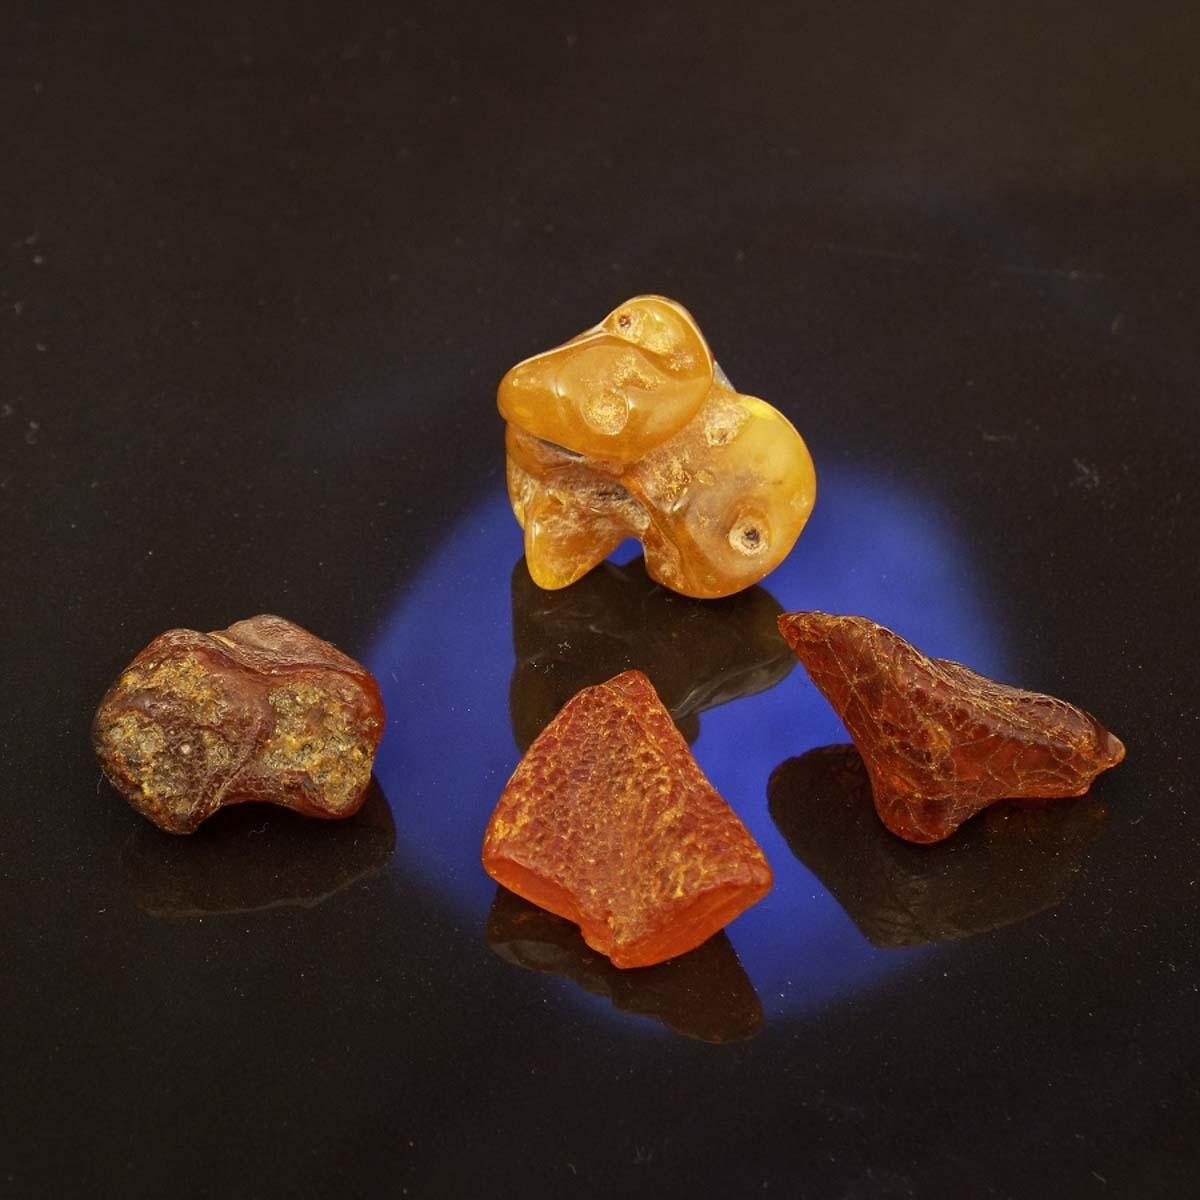 100/% Natur-Bernstein Amber Bead AmberBeads Sammelarmband 1A Qualität Restposten